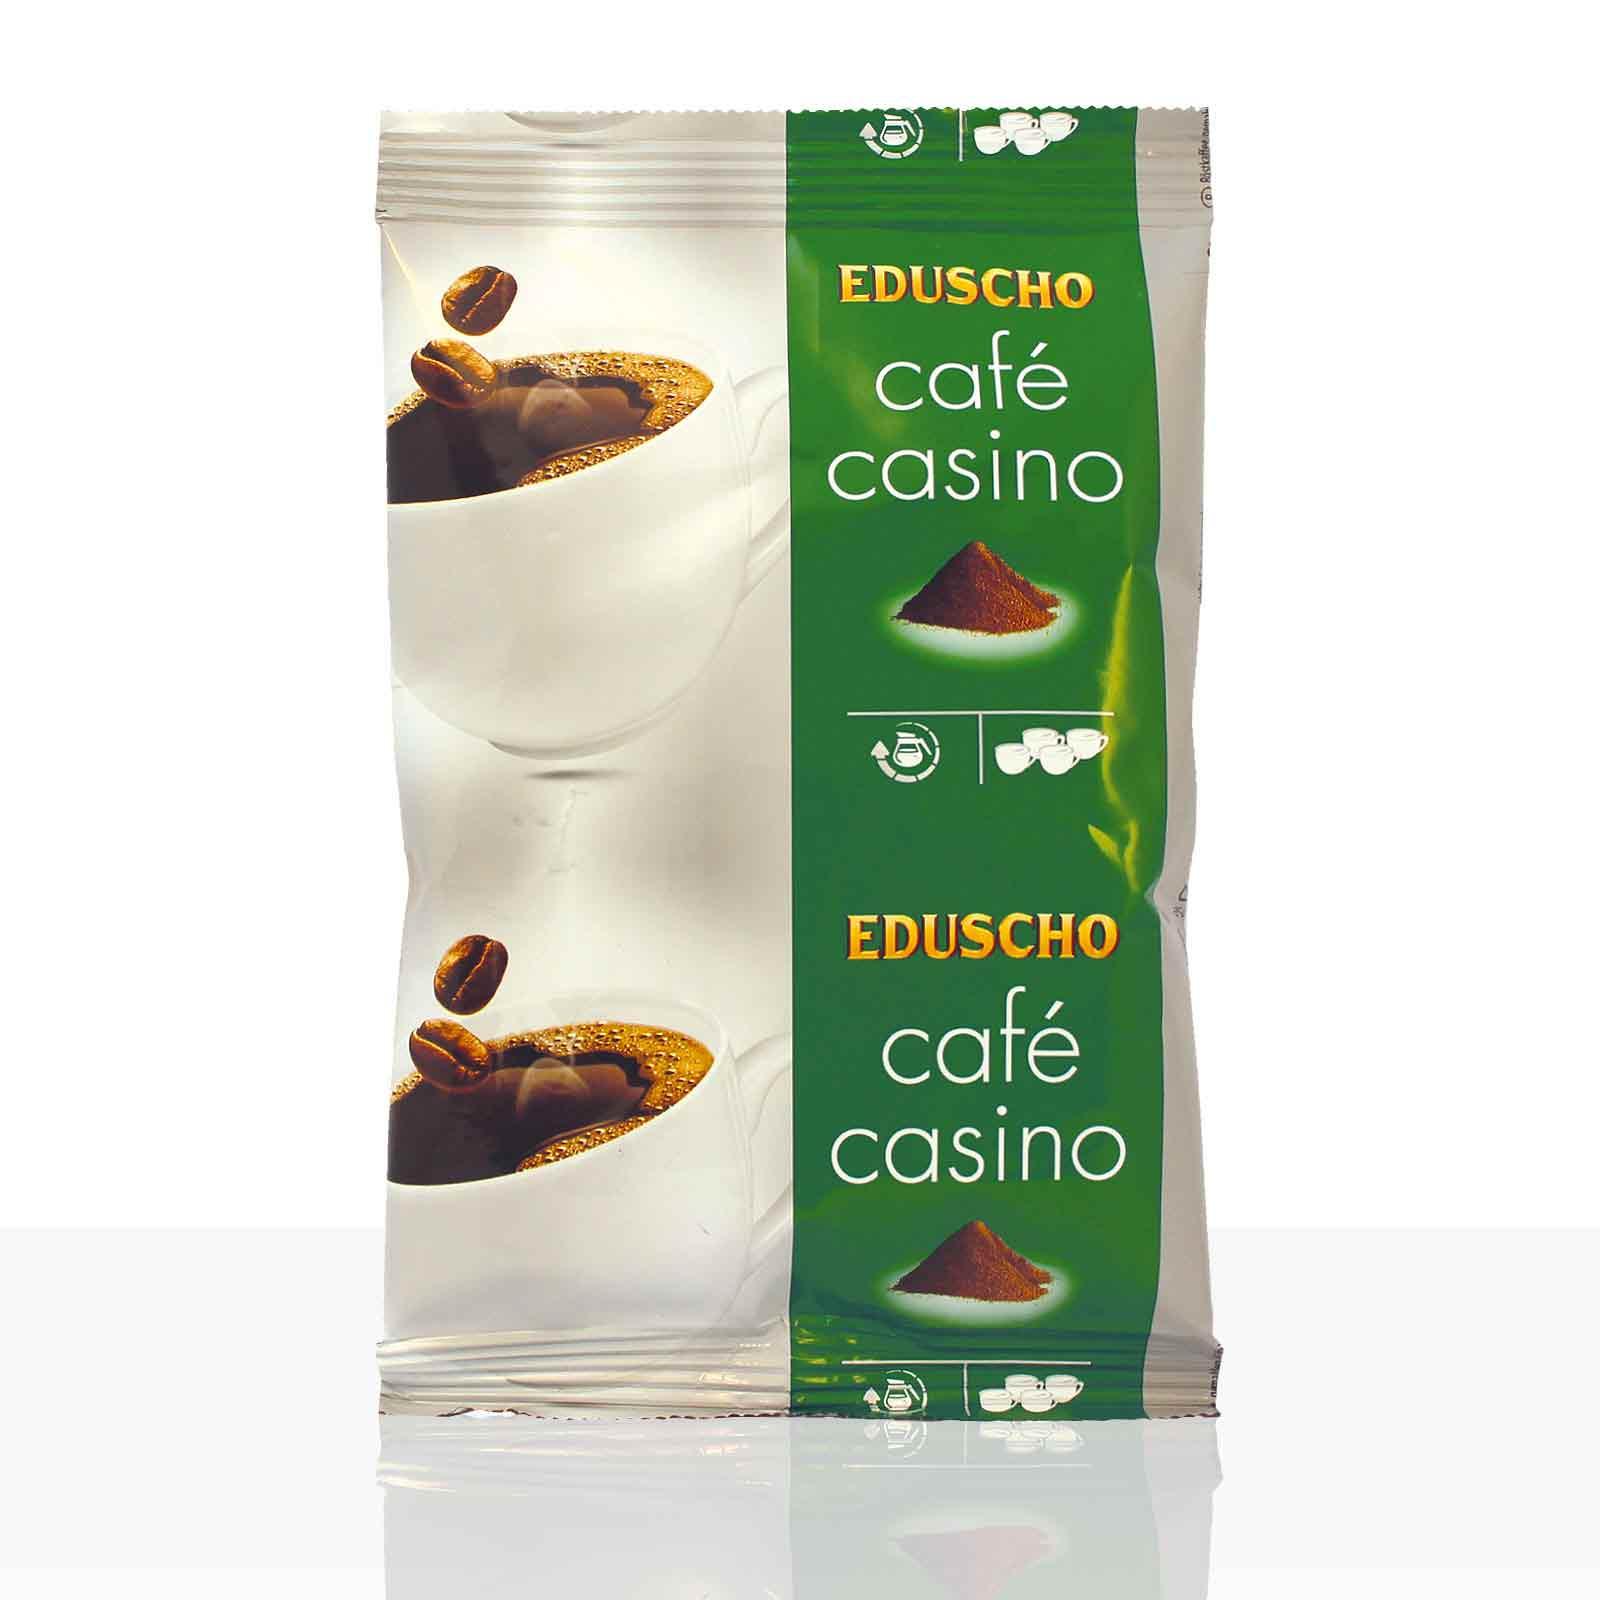 Tchibo / Eduscho Café Casino Plus 1 x 60g, Kaffee gemahlen portioniert